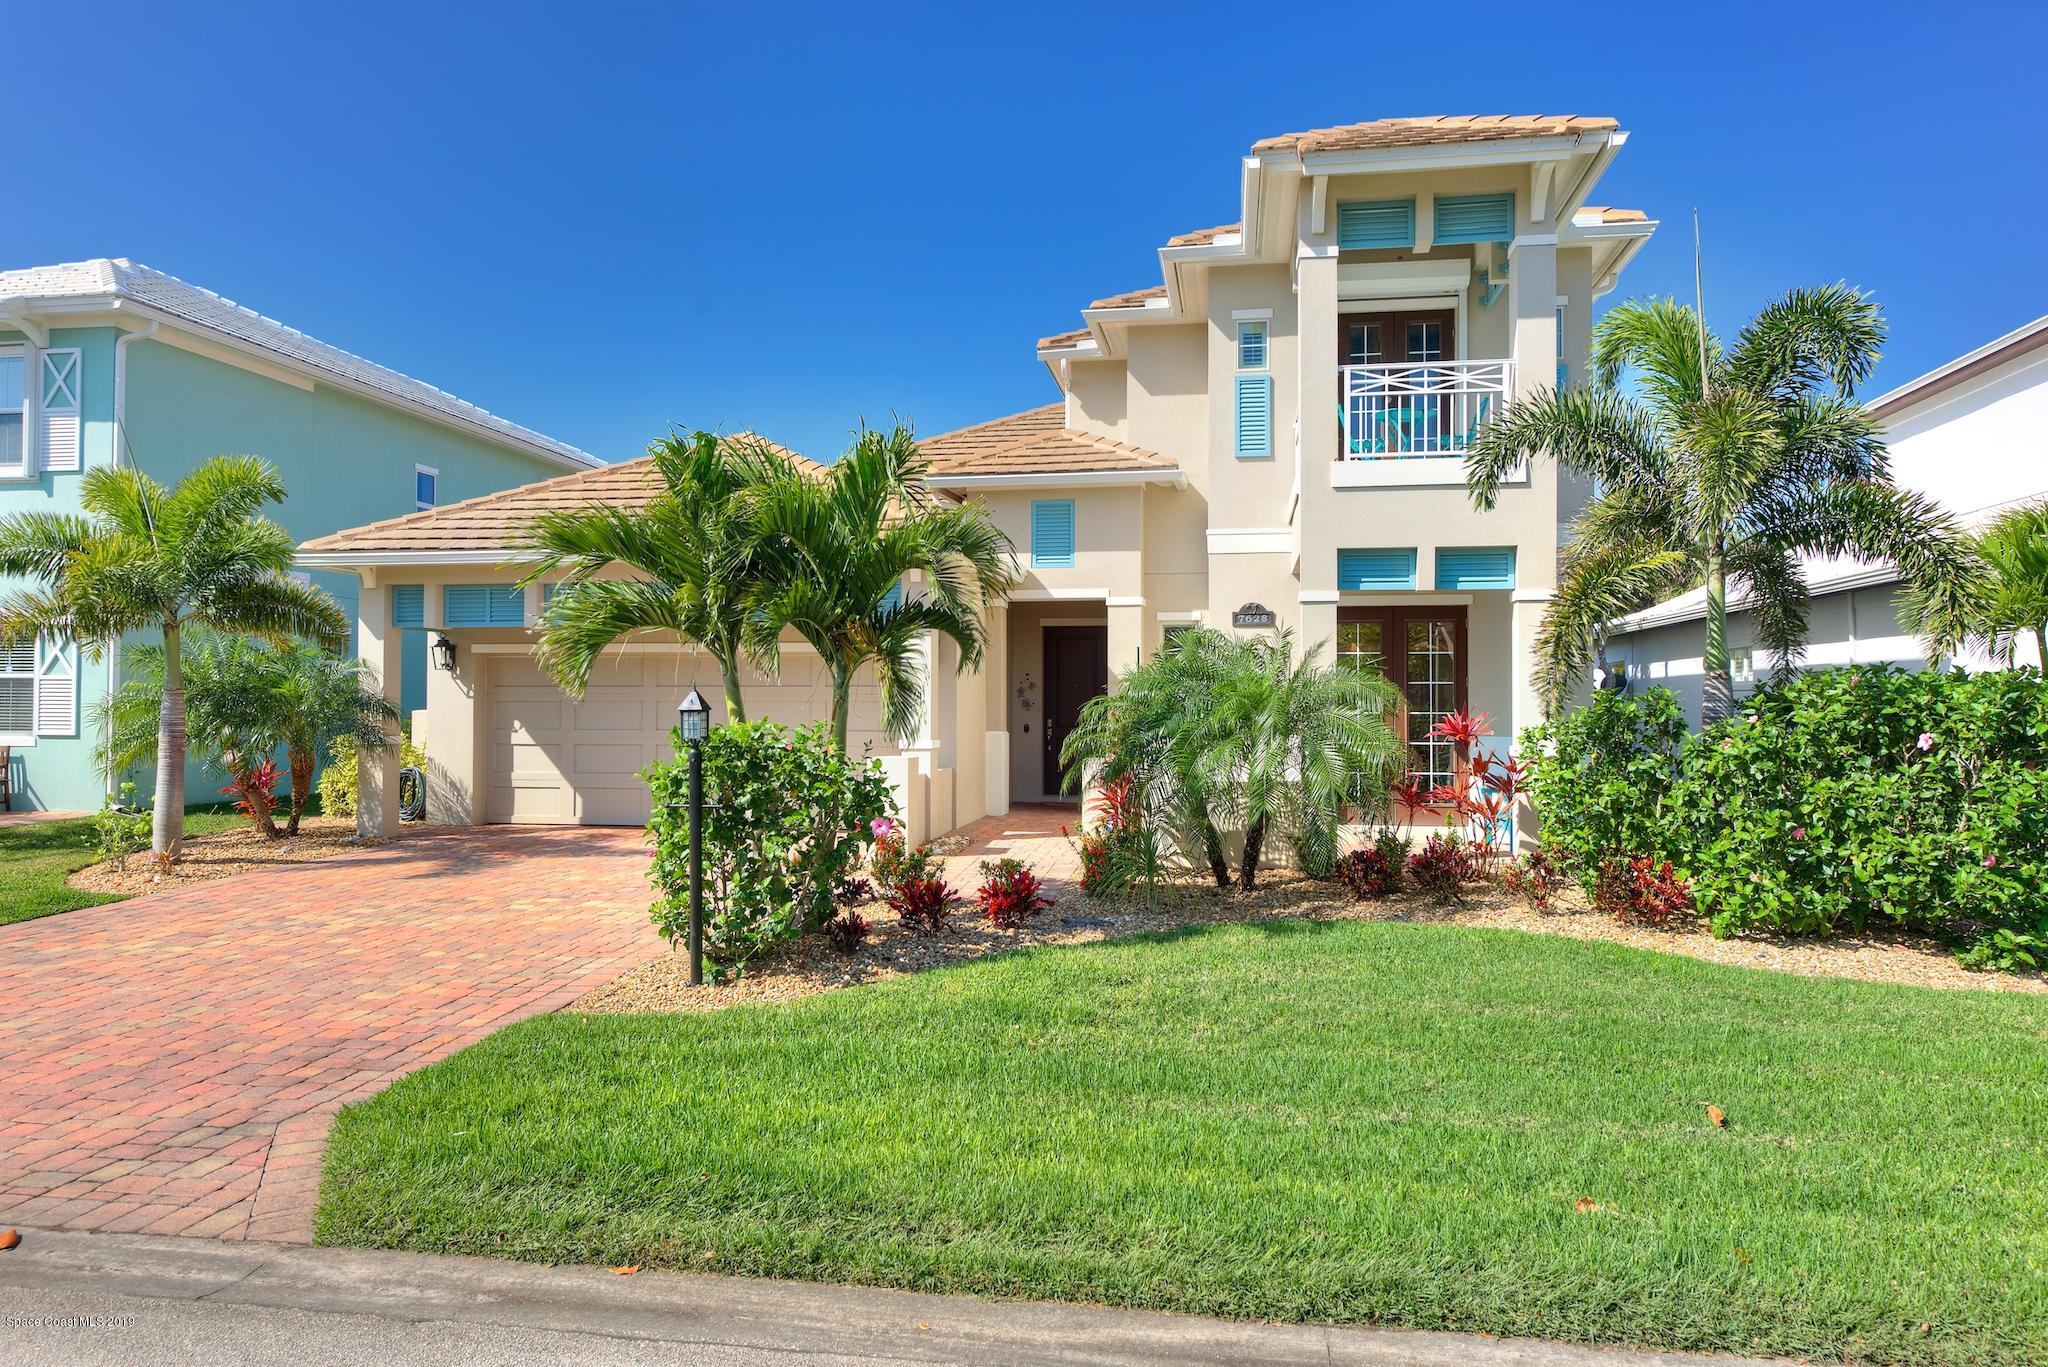 Single Family Home for Sale at 7628 Kiawah 7628 Kiawah Melbourne Beach, Florida 32951 United States